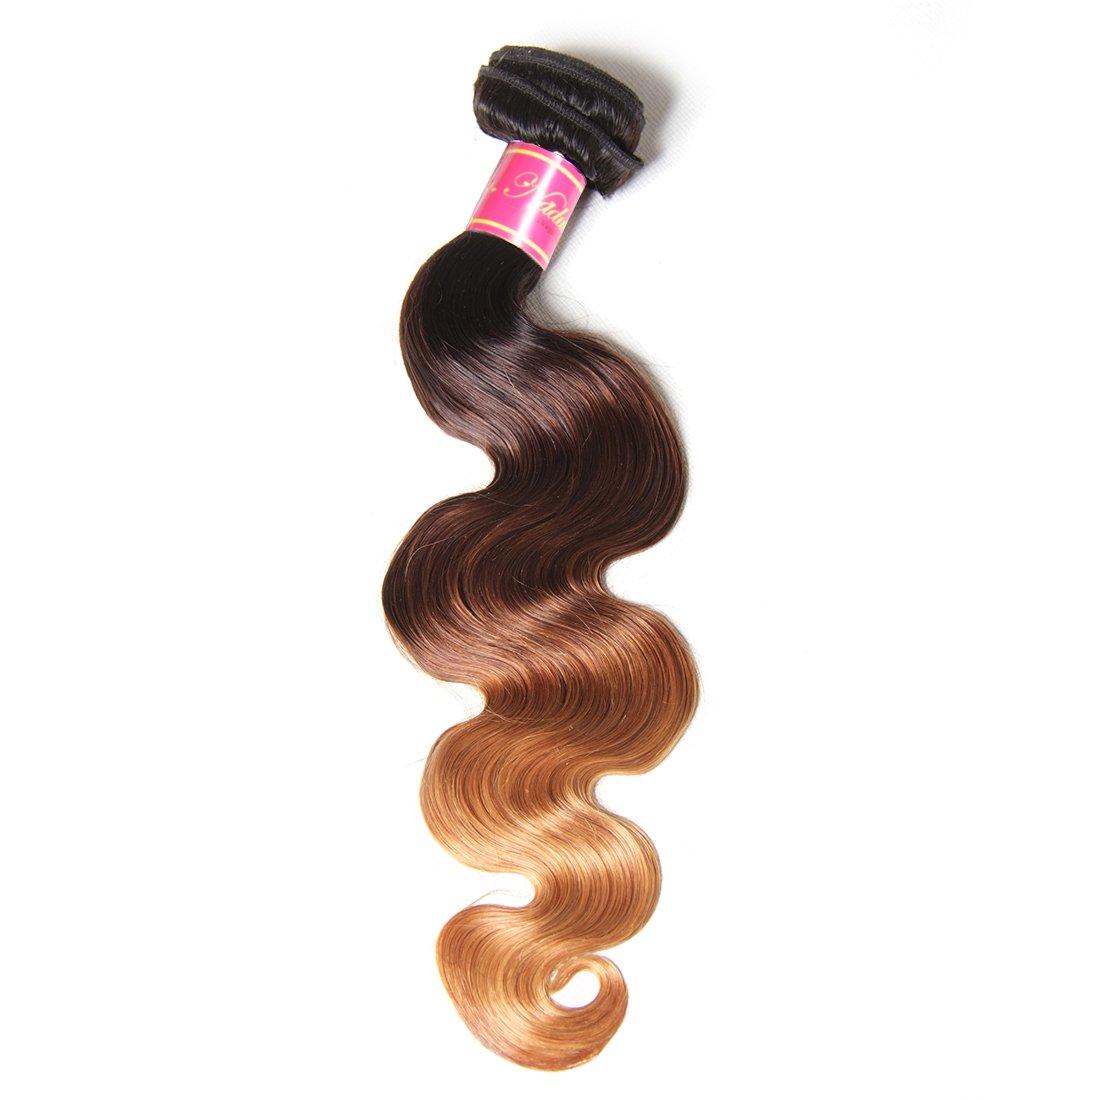 Nadula 8A Grade Brazilian 3 Tone Ombre Color 1B/4/27# Body Wave Hair 1 Bundle Cheap Brazilian Virgin Human Hair Products 100+/-5g/pcs Weave Extensions Natural Color (16inch)